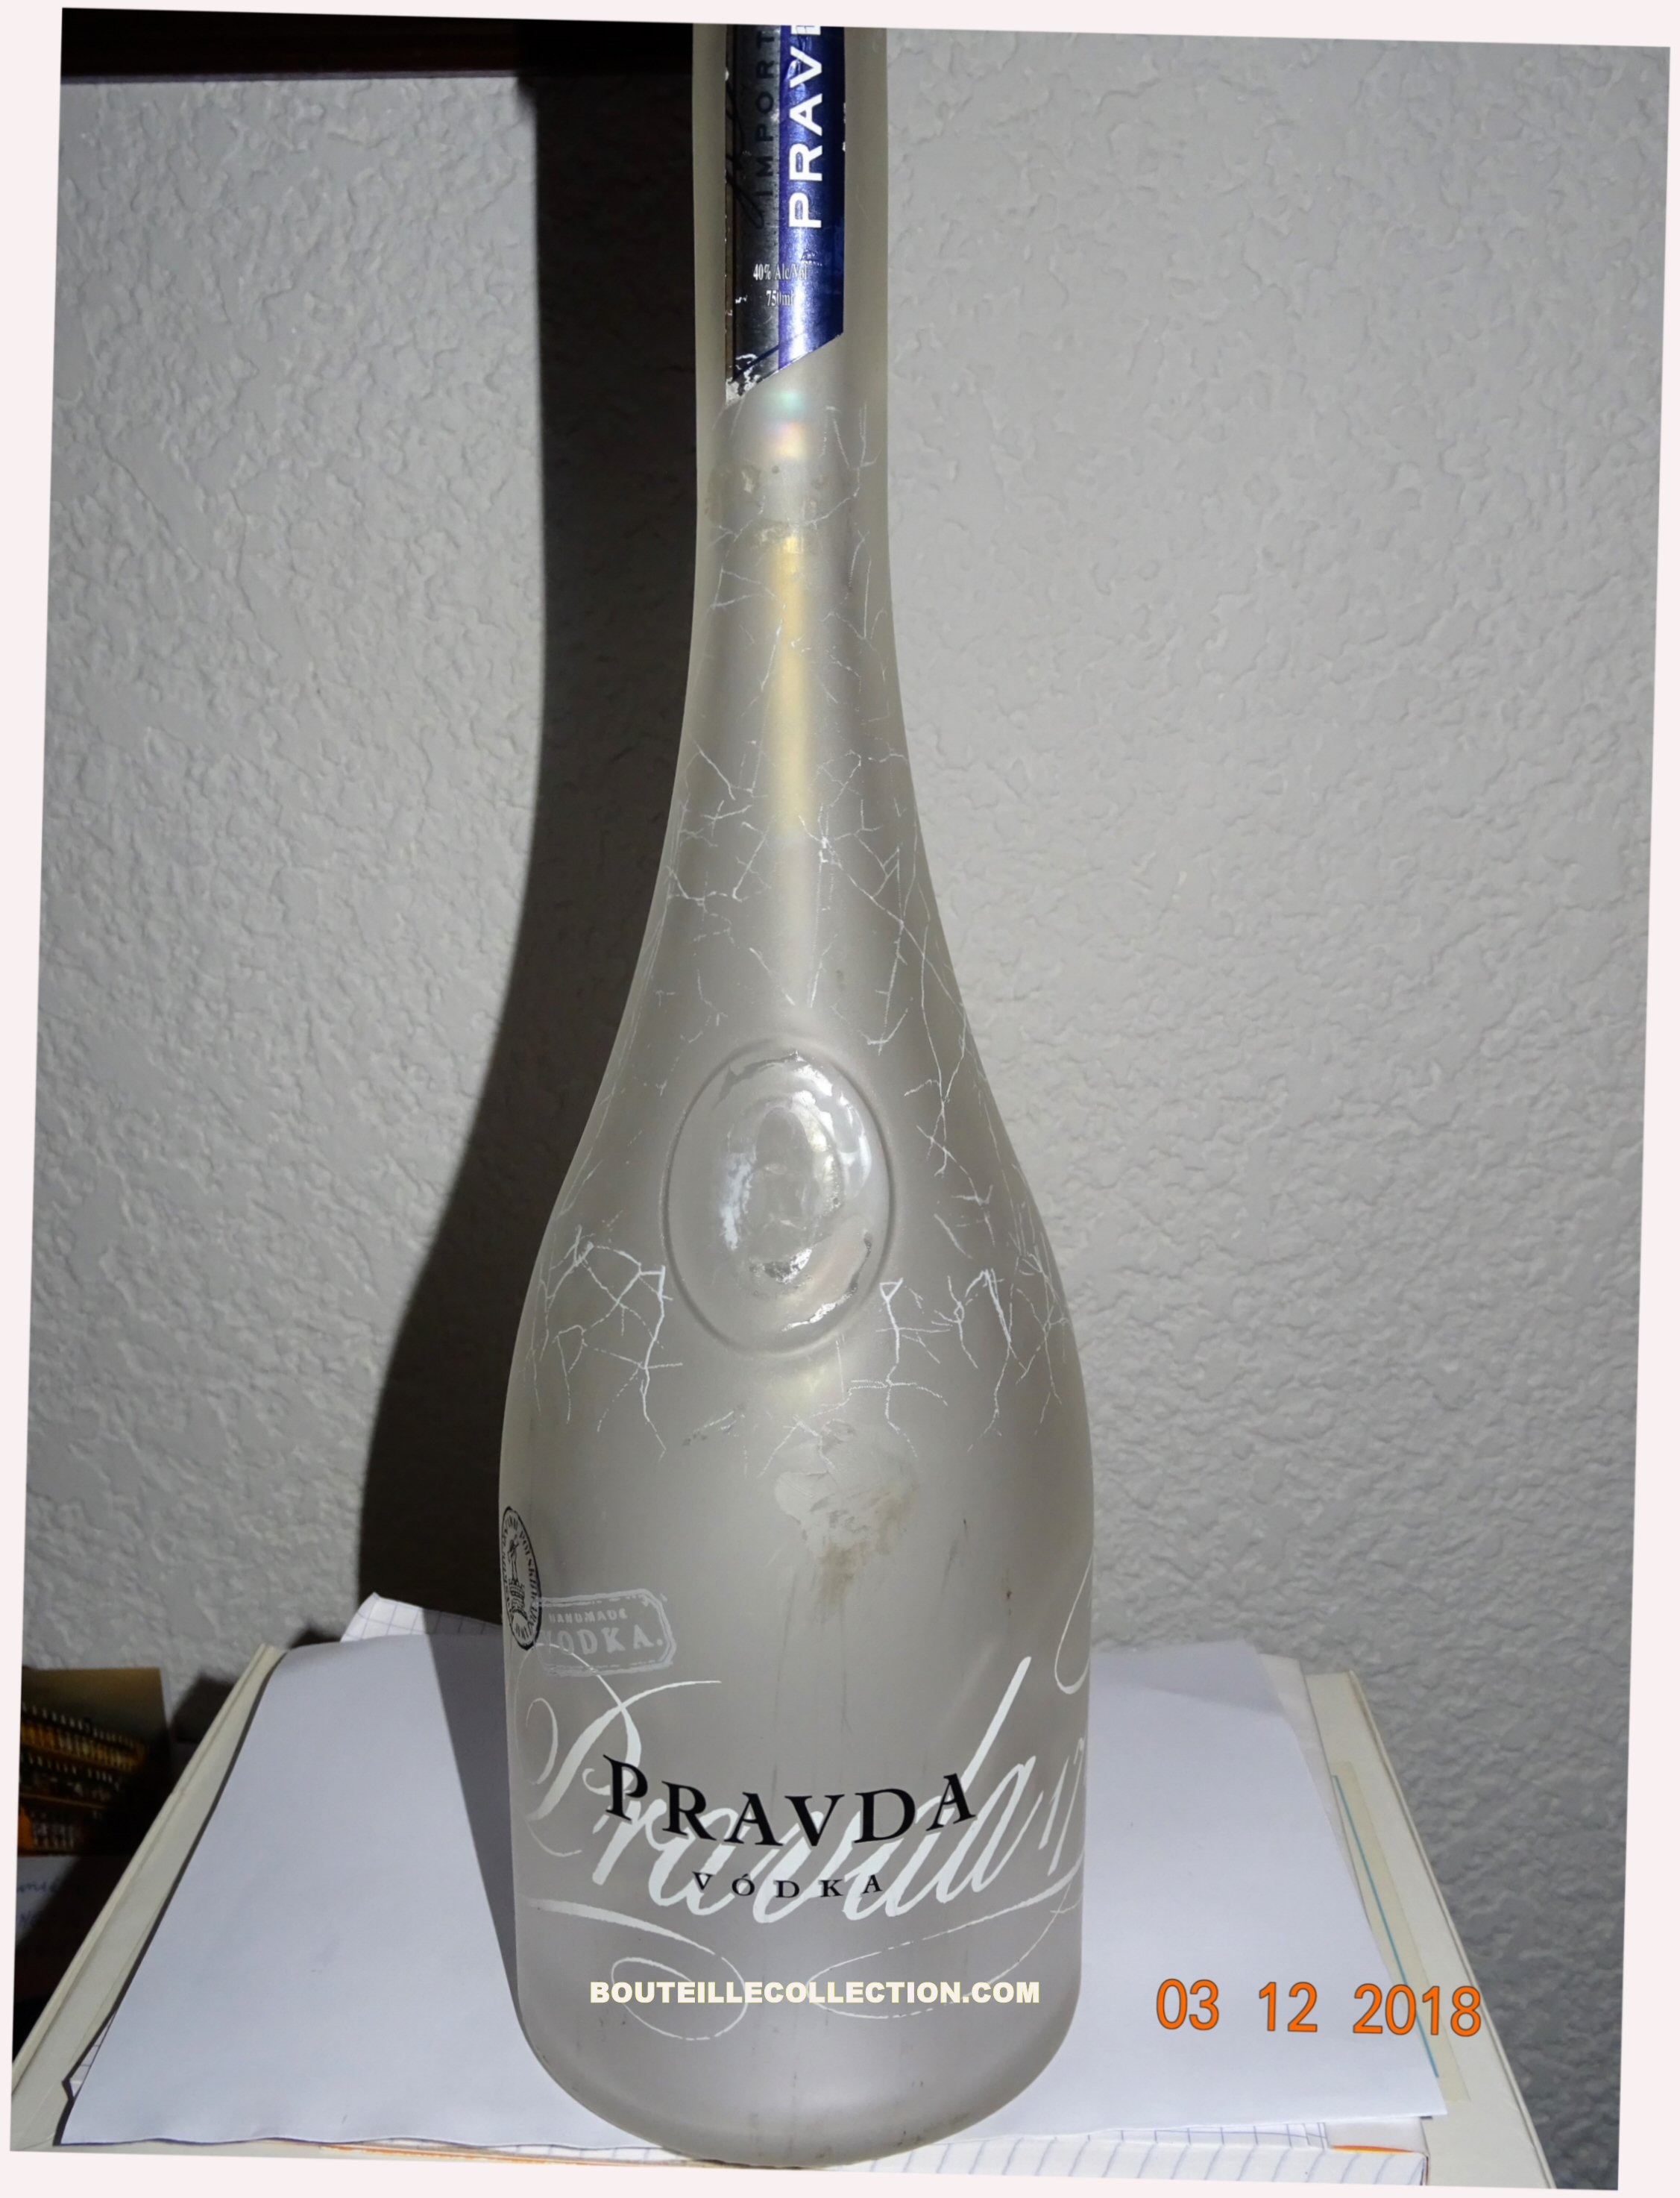 PRAVDA 1743 75CL B .JPG